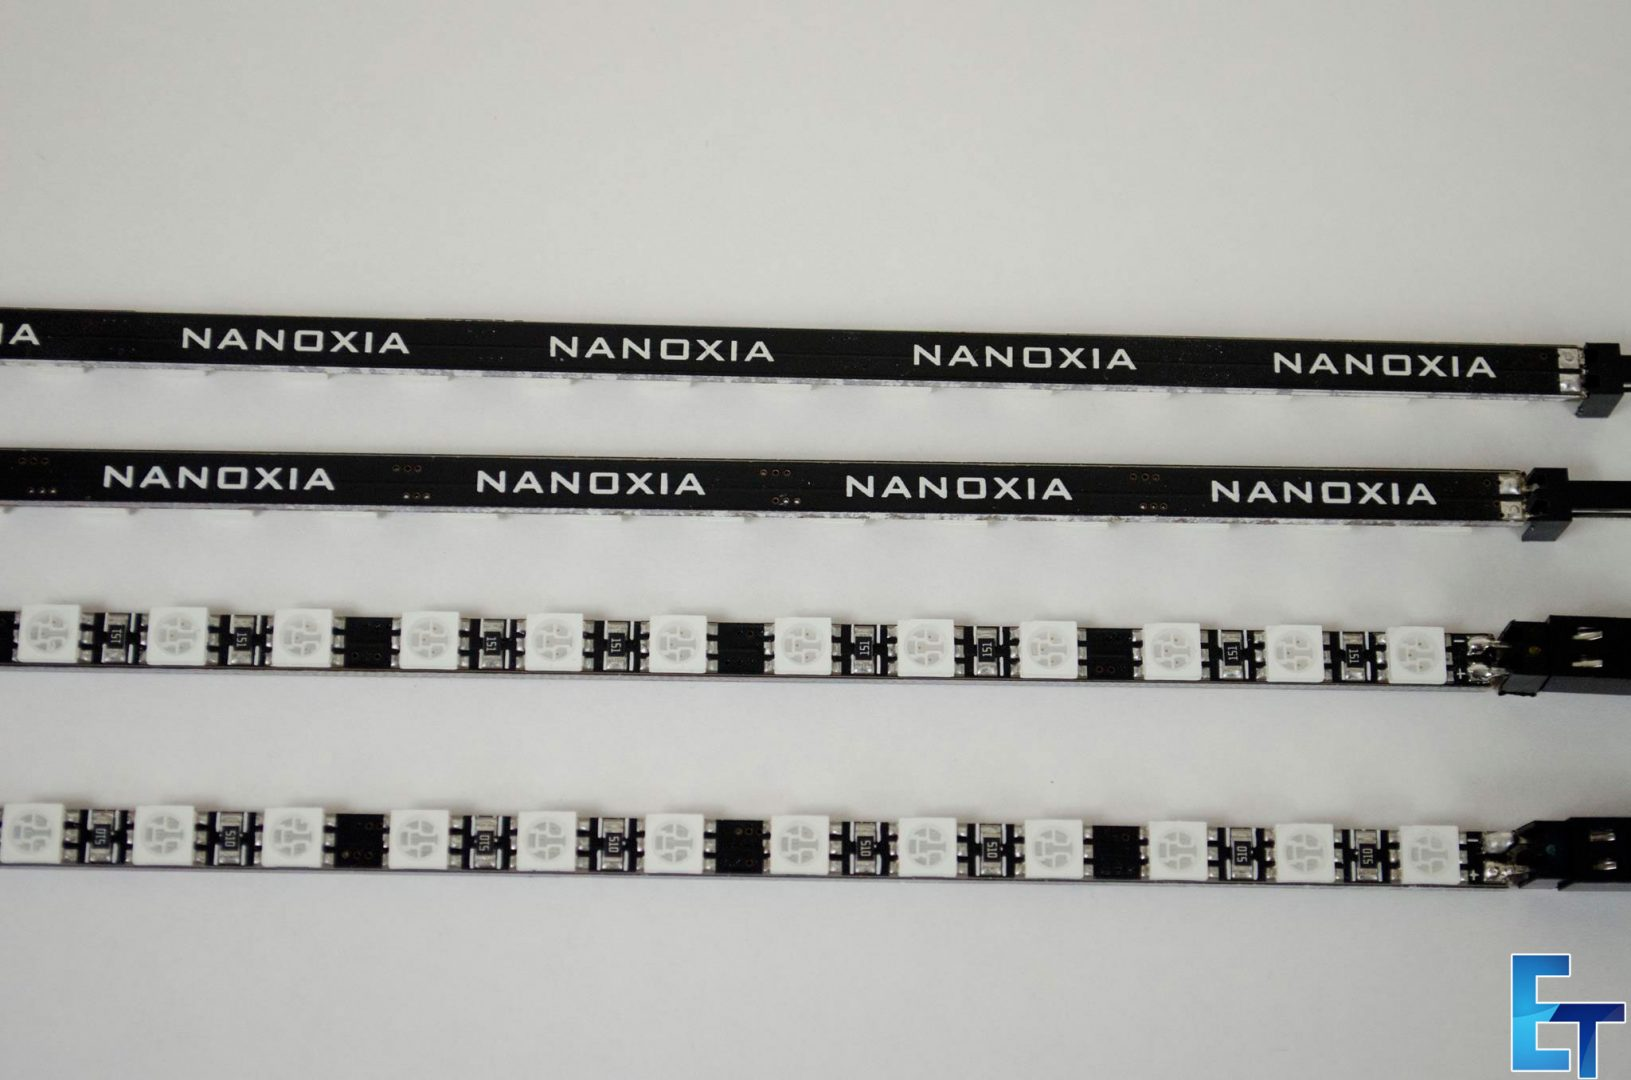 Nanoxia-Rigid-LED-_2